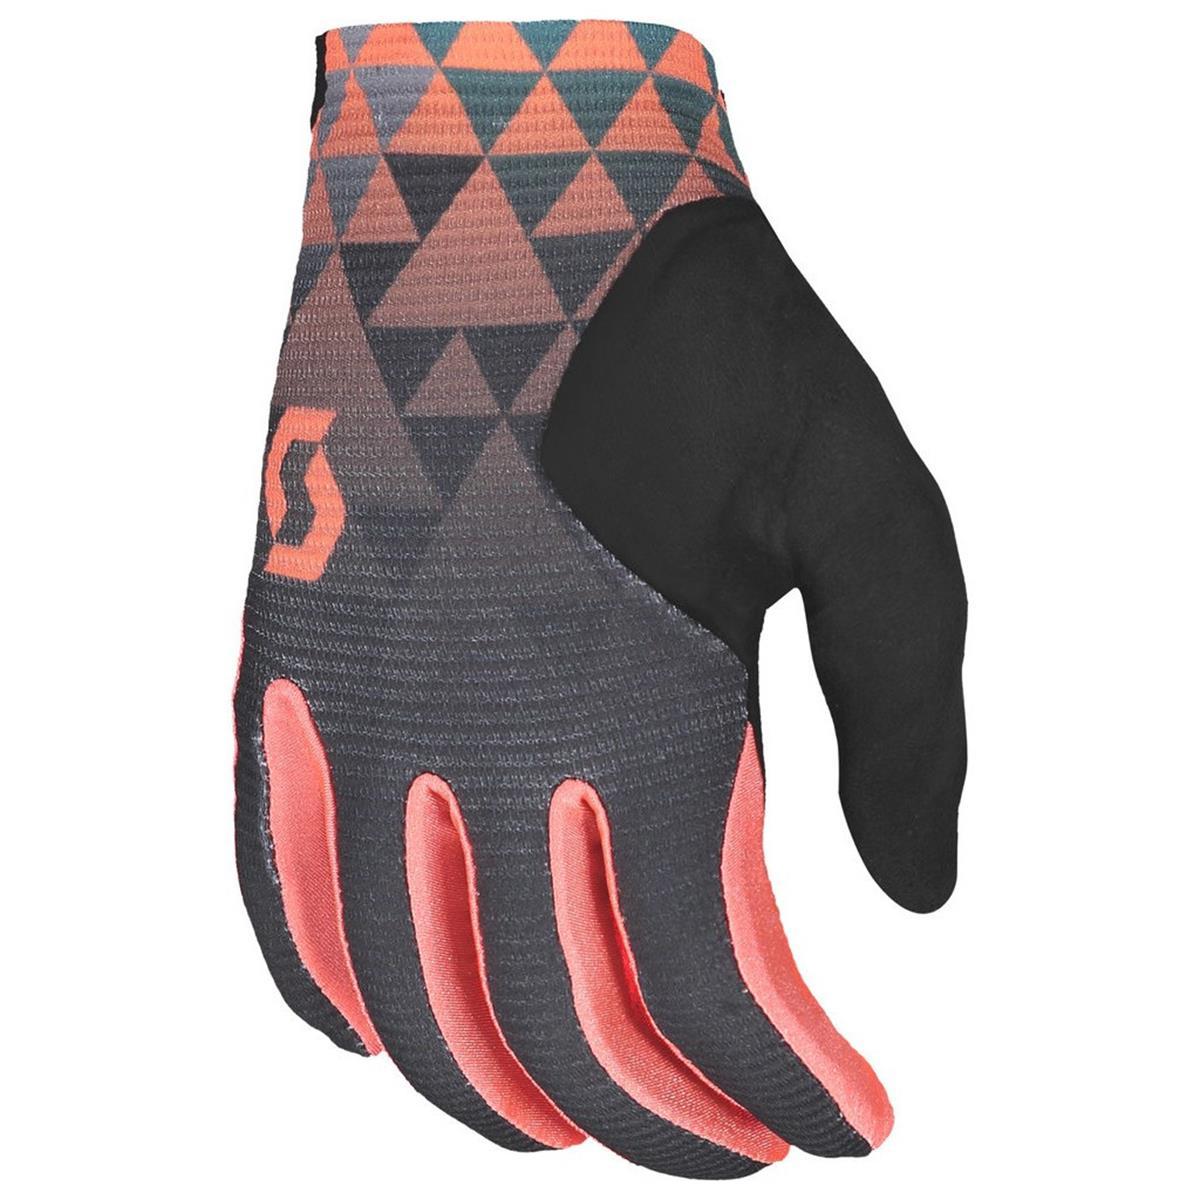 Scott Bike-Handschuhe Ridance Dunkelgrau/Camellia Pink